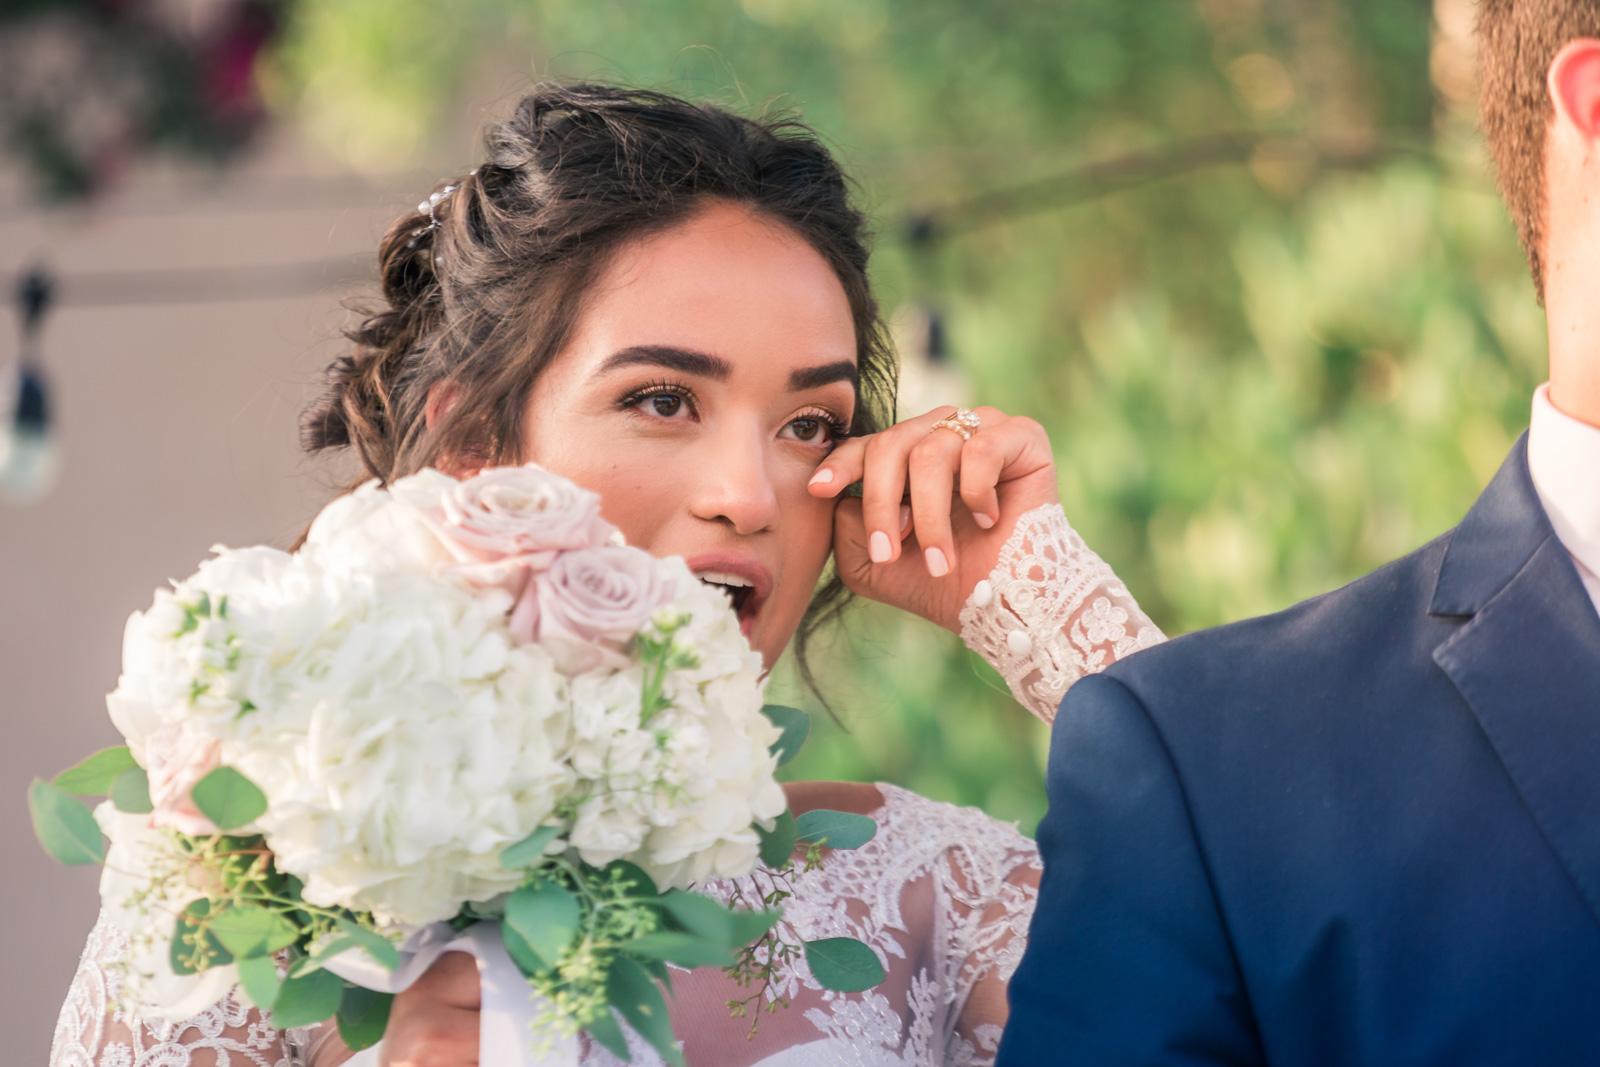 260_Angel-Brea-Orange-County_Joseph-Barber-Wedding-Photography.jpg